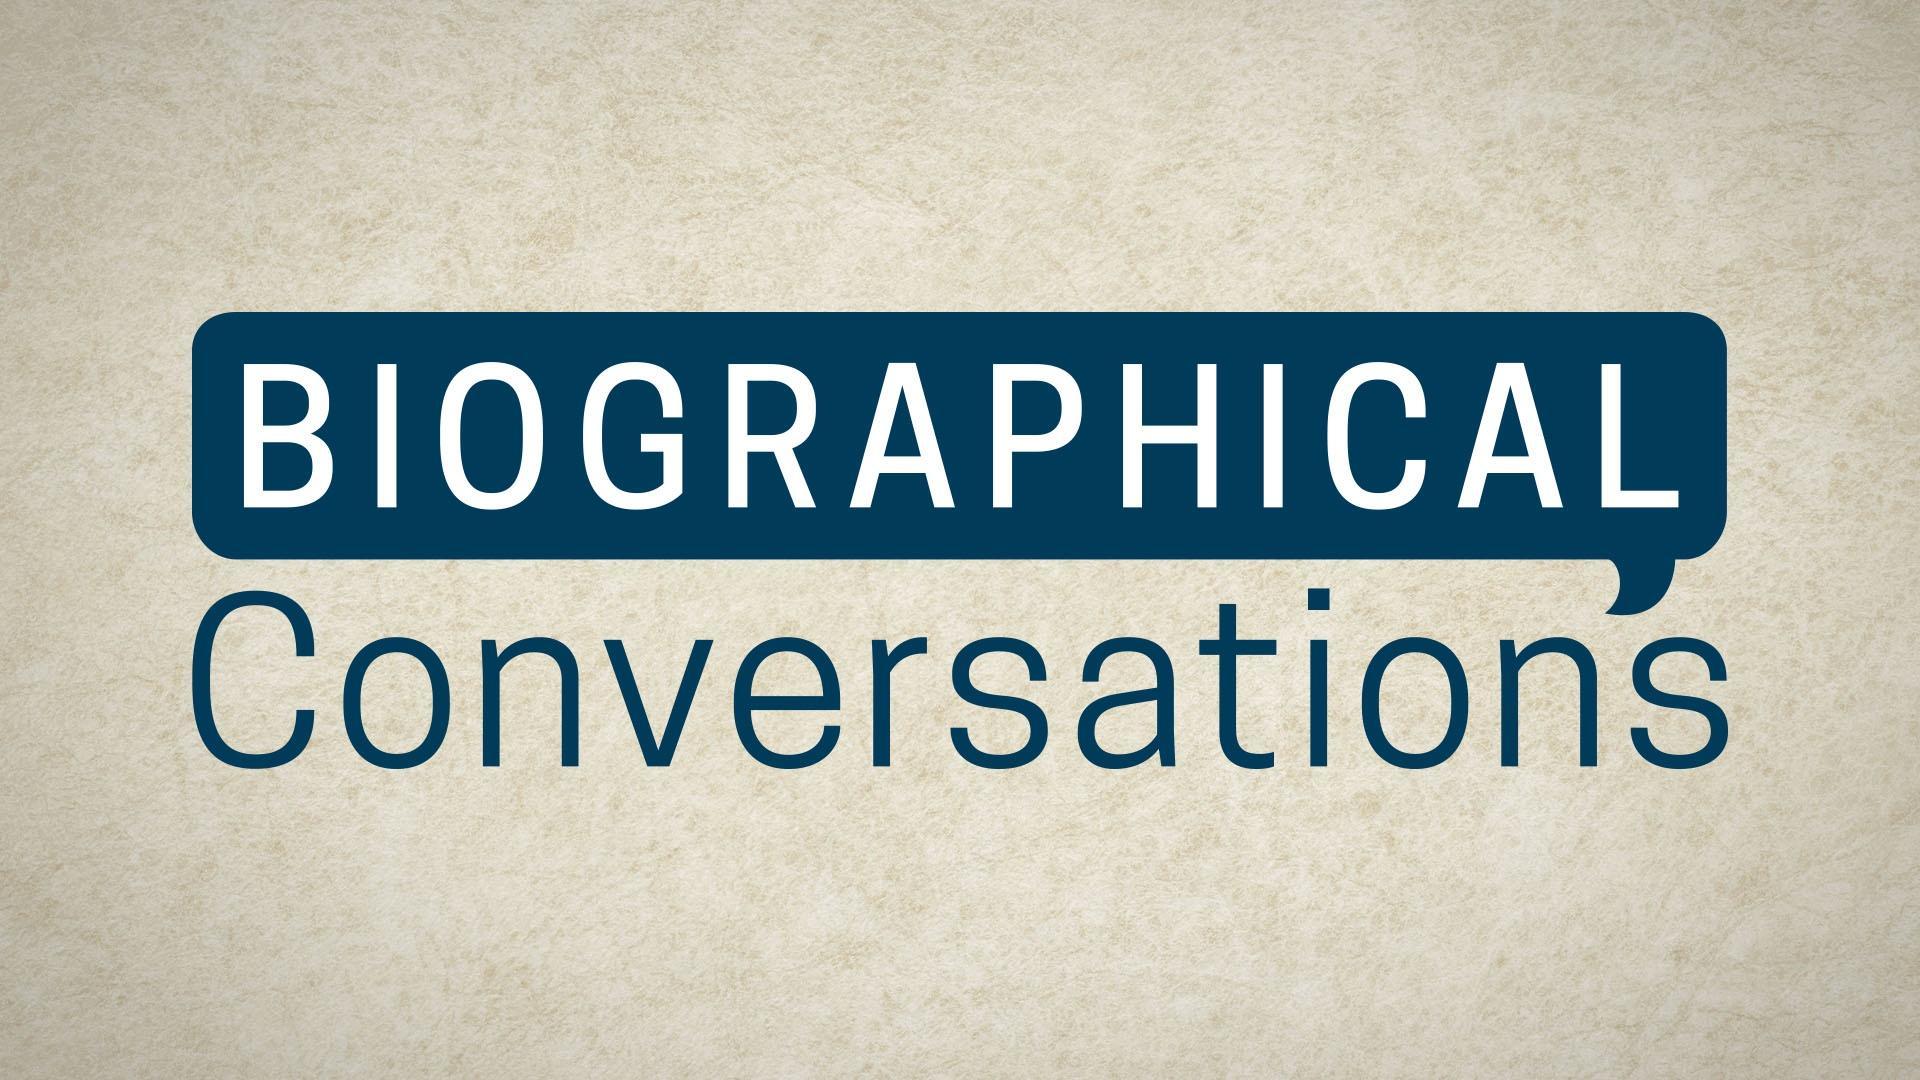 Biographical Conversations